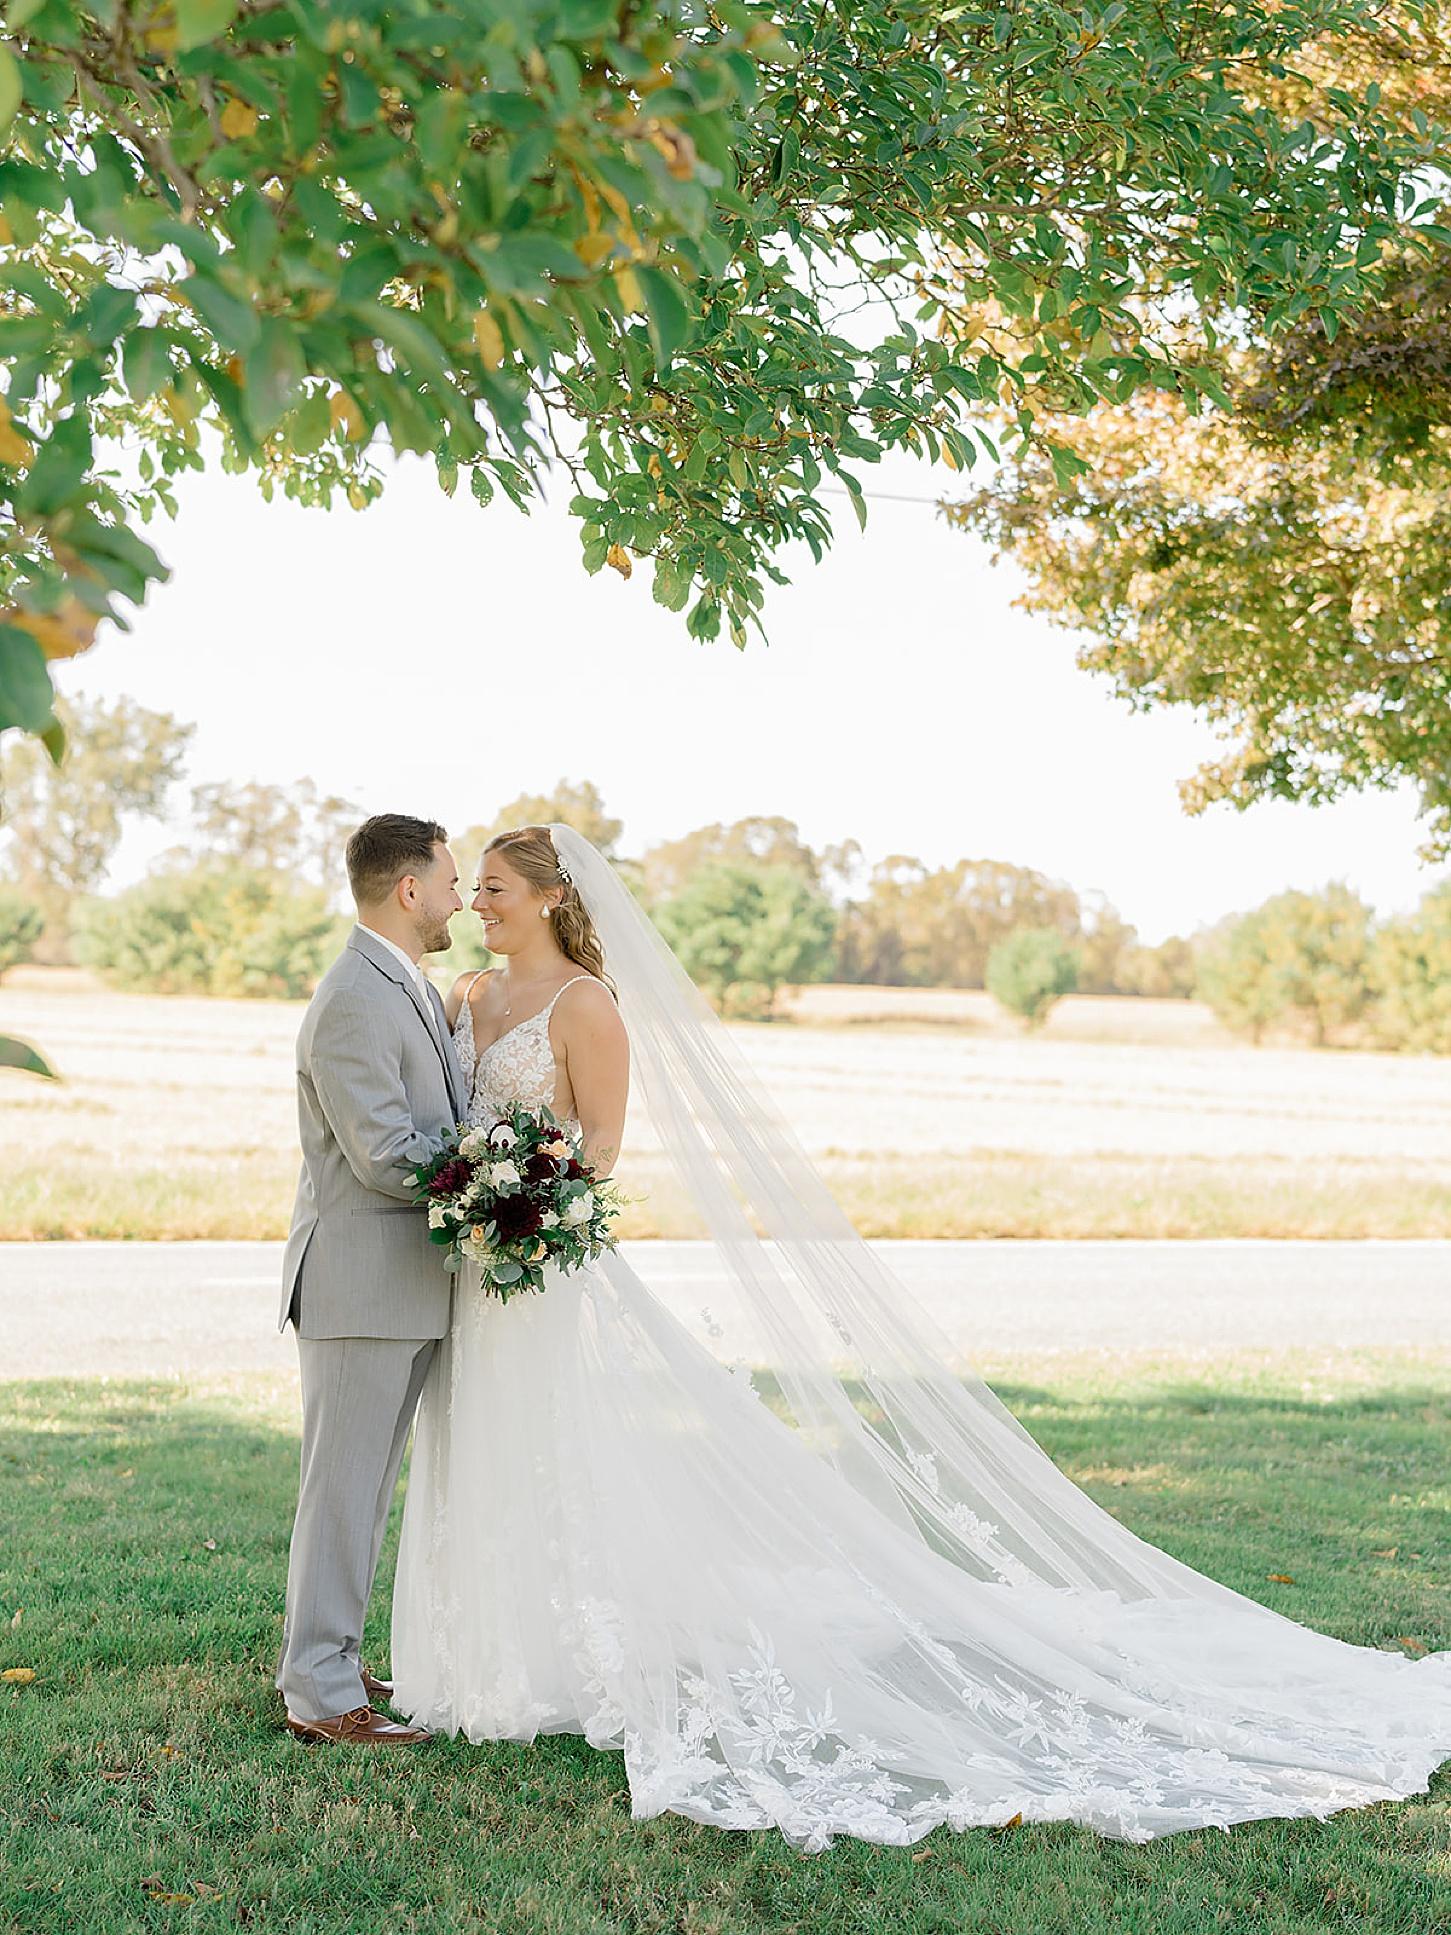 Valenzano Winery Vitners Pavillion Wedding Photography by Magdalena Studios 0007